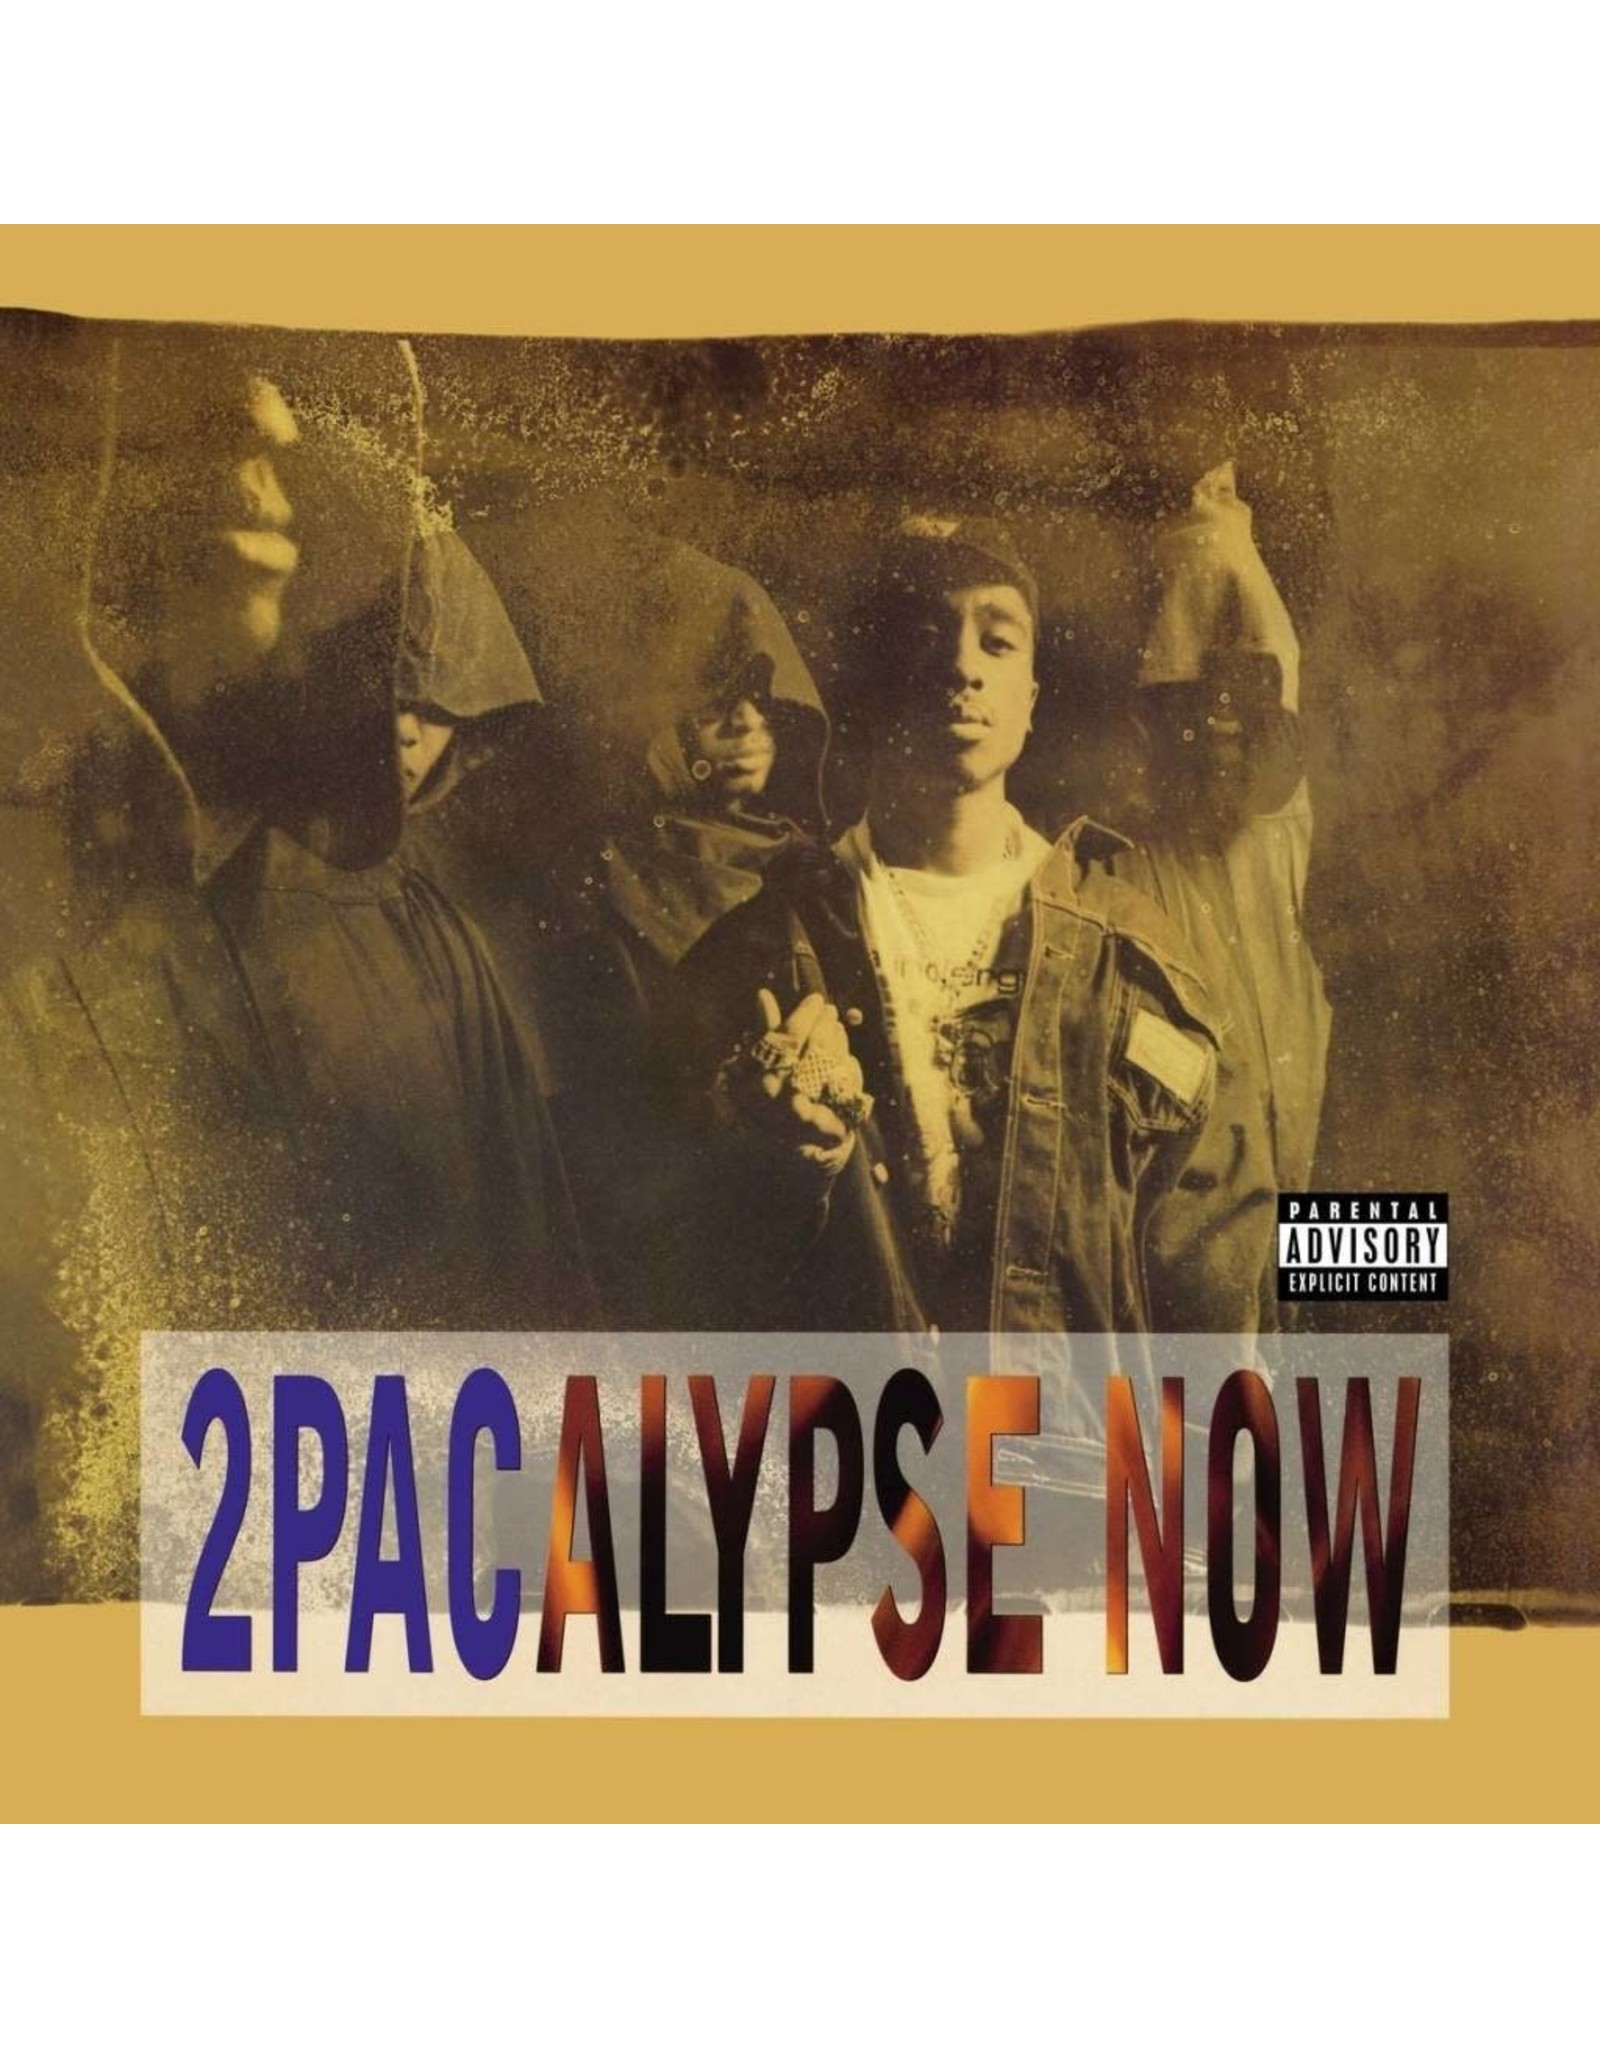 2Pac - 2pacalypse Now LP